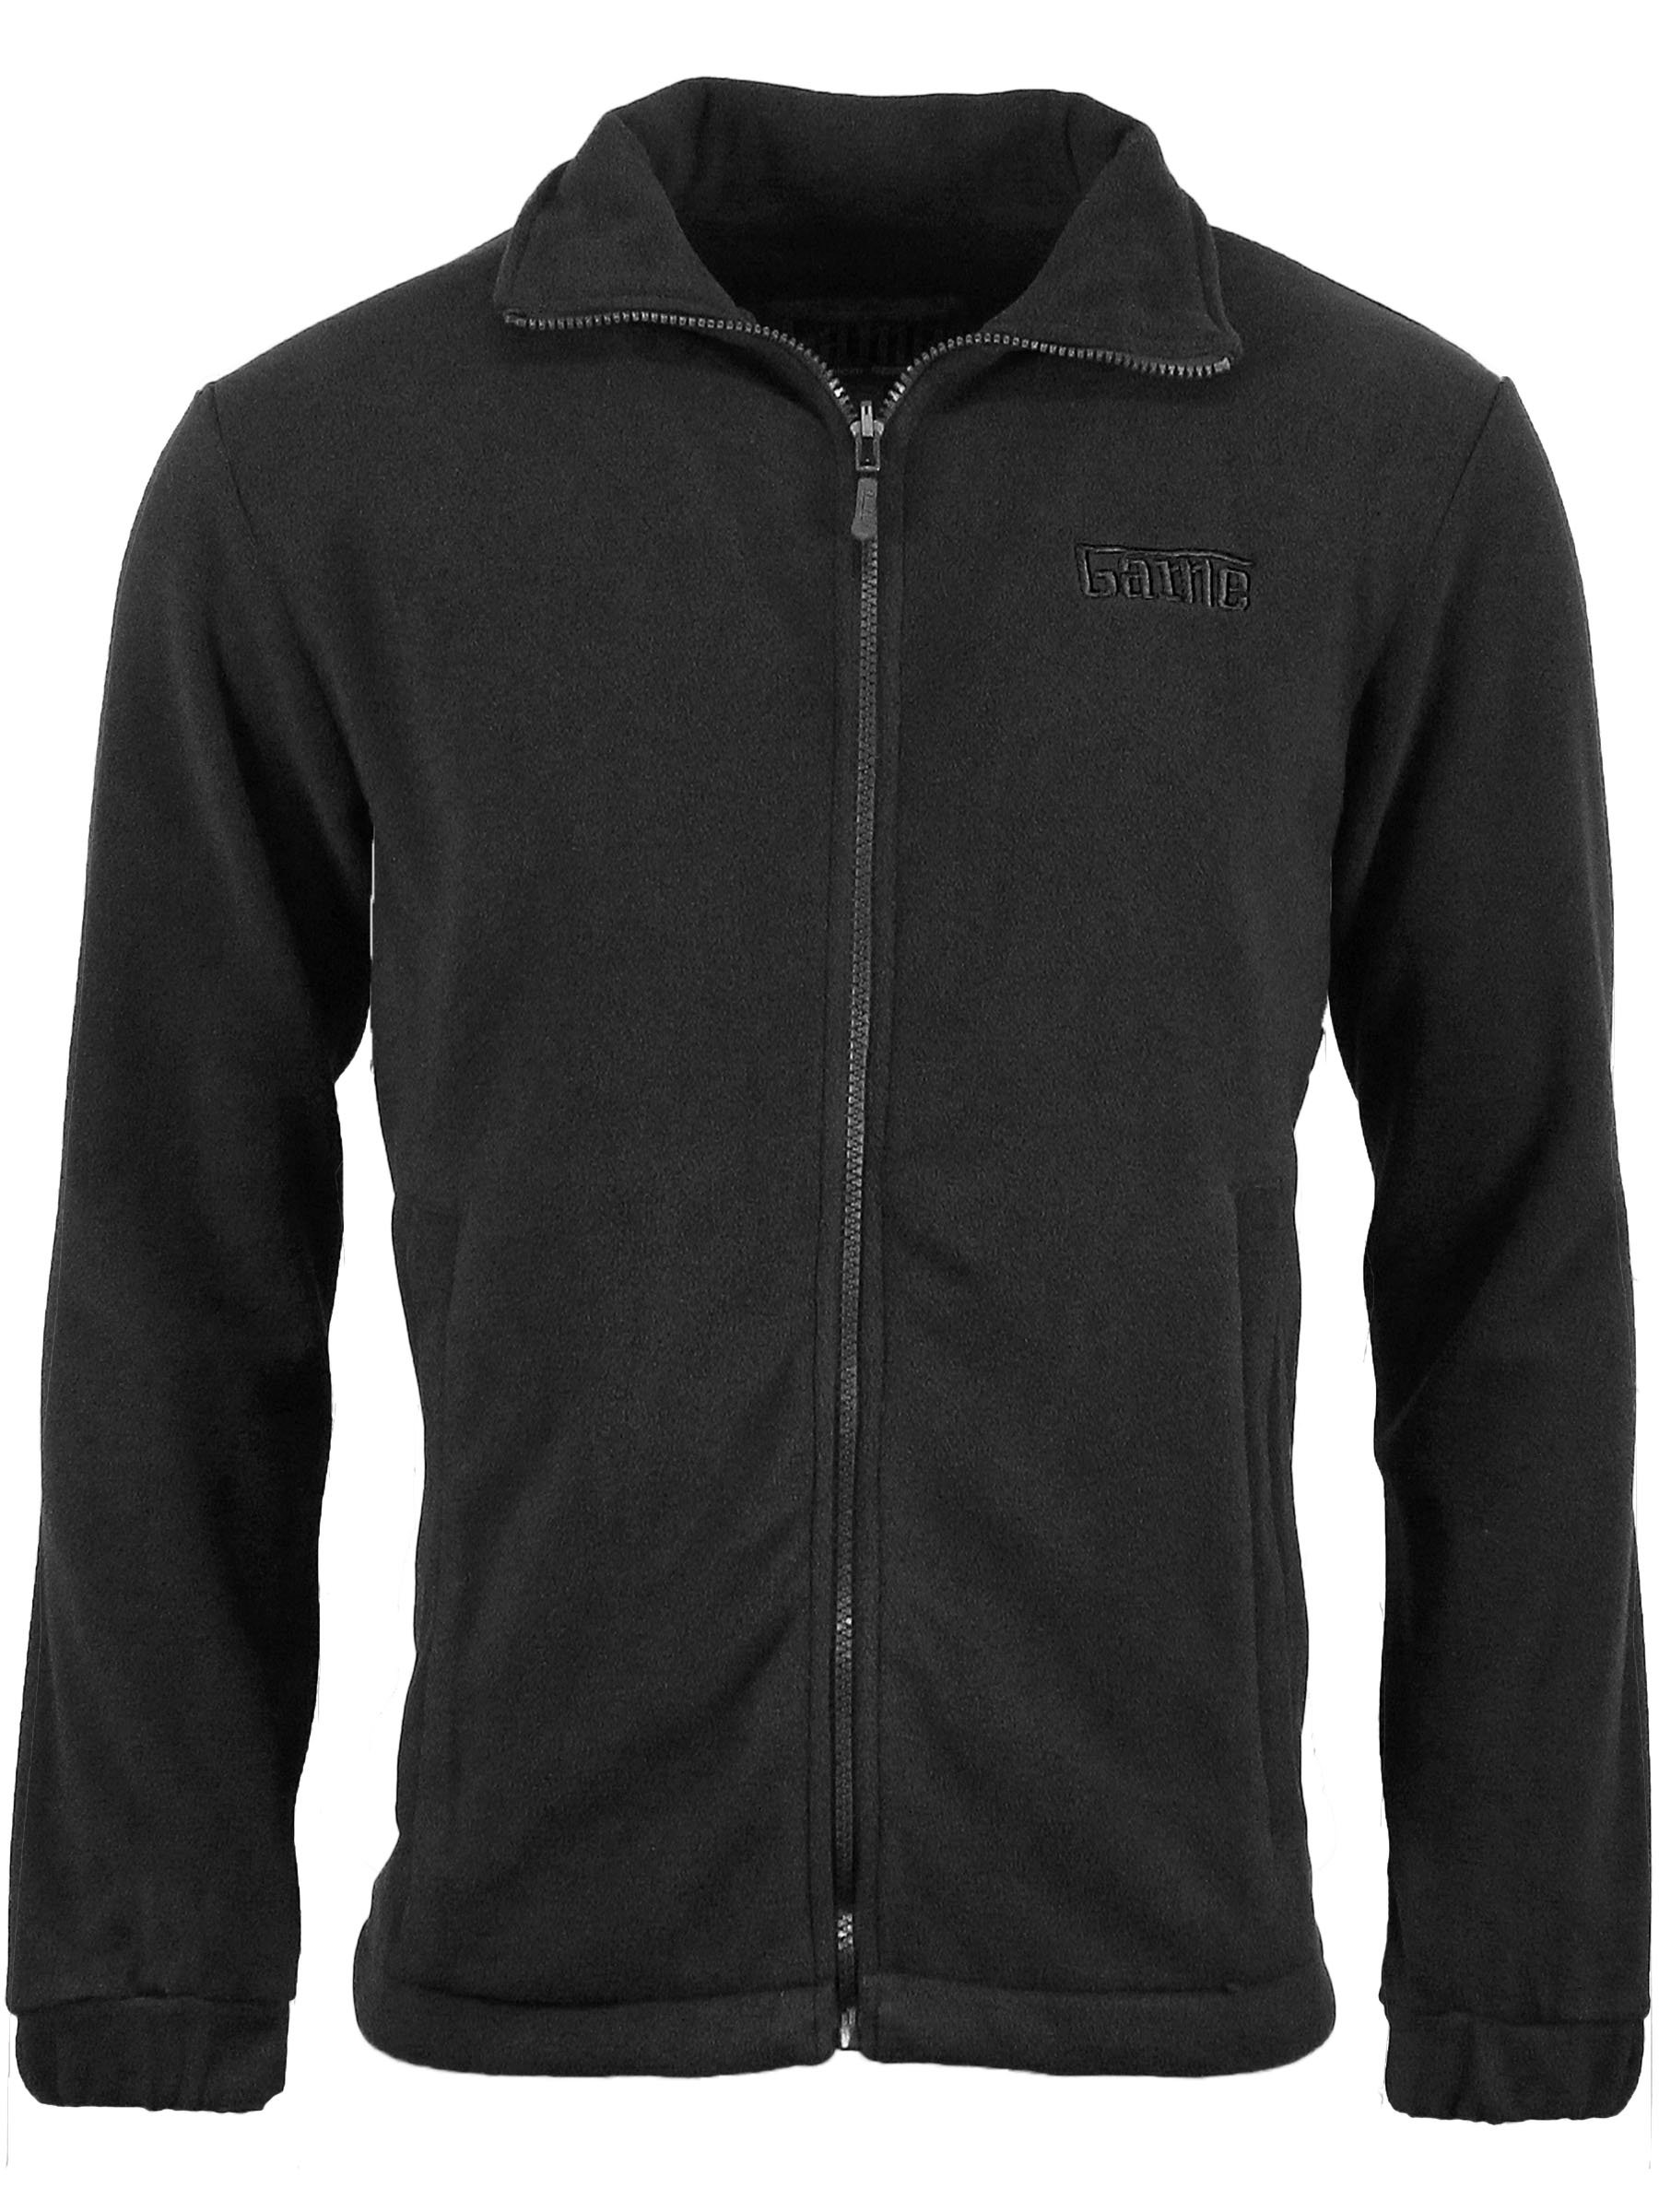 Game Technical Apparel Unisex Jacket Various Colours Stealth Fleece - Black 2XL